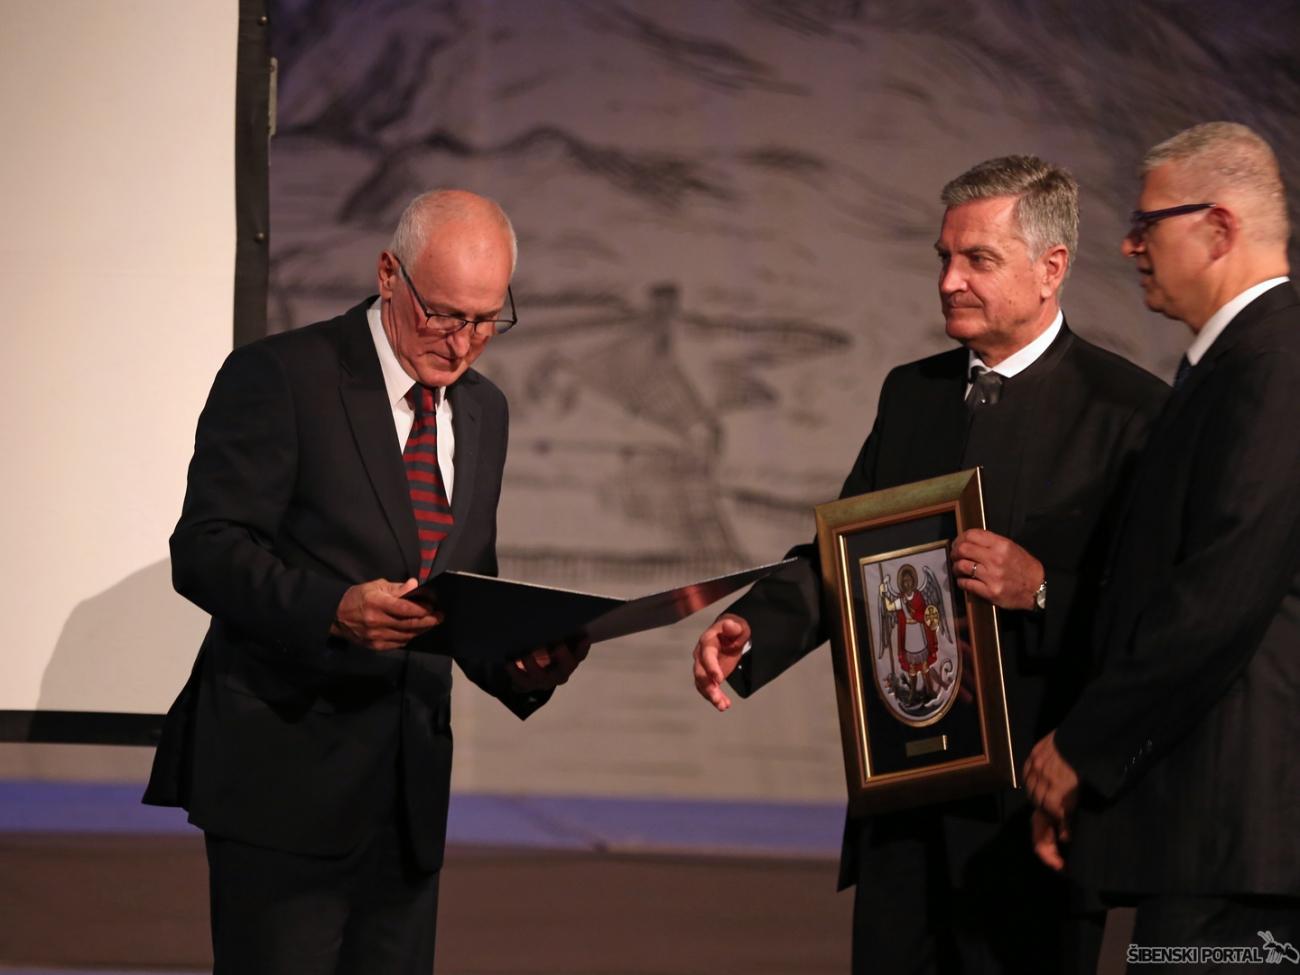 nagrada grada sibenika 280917 3